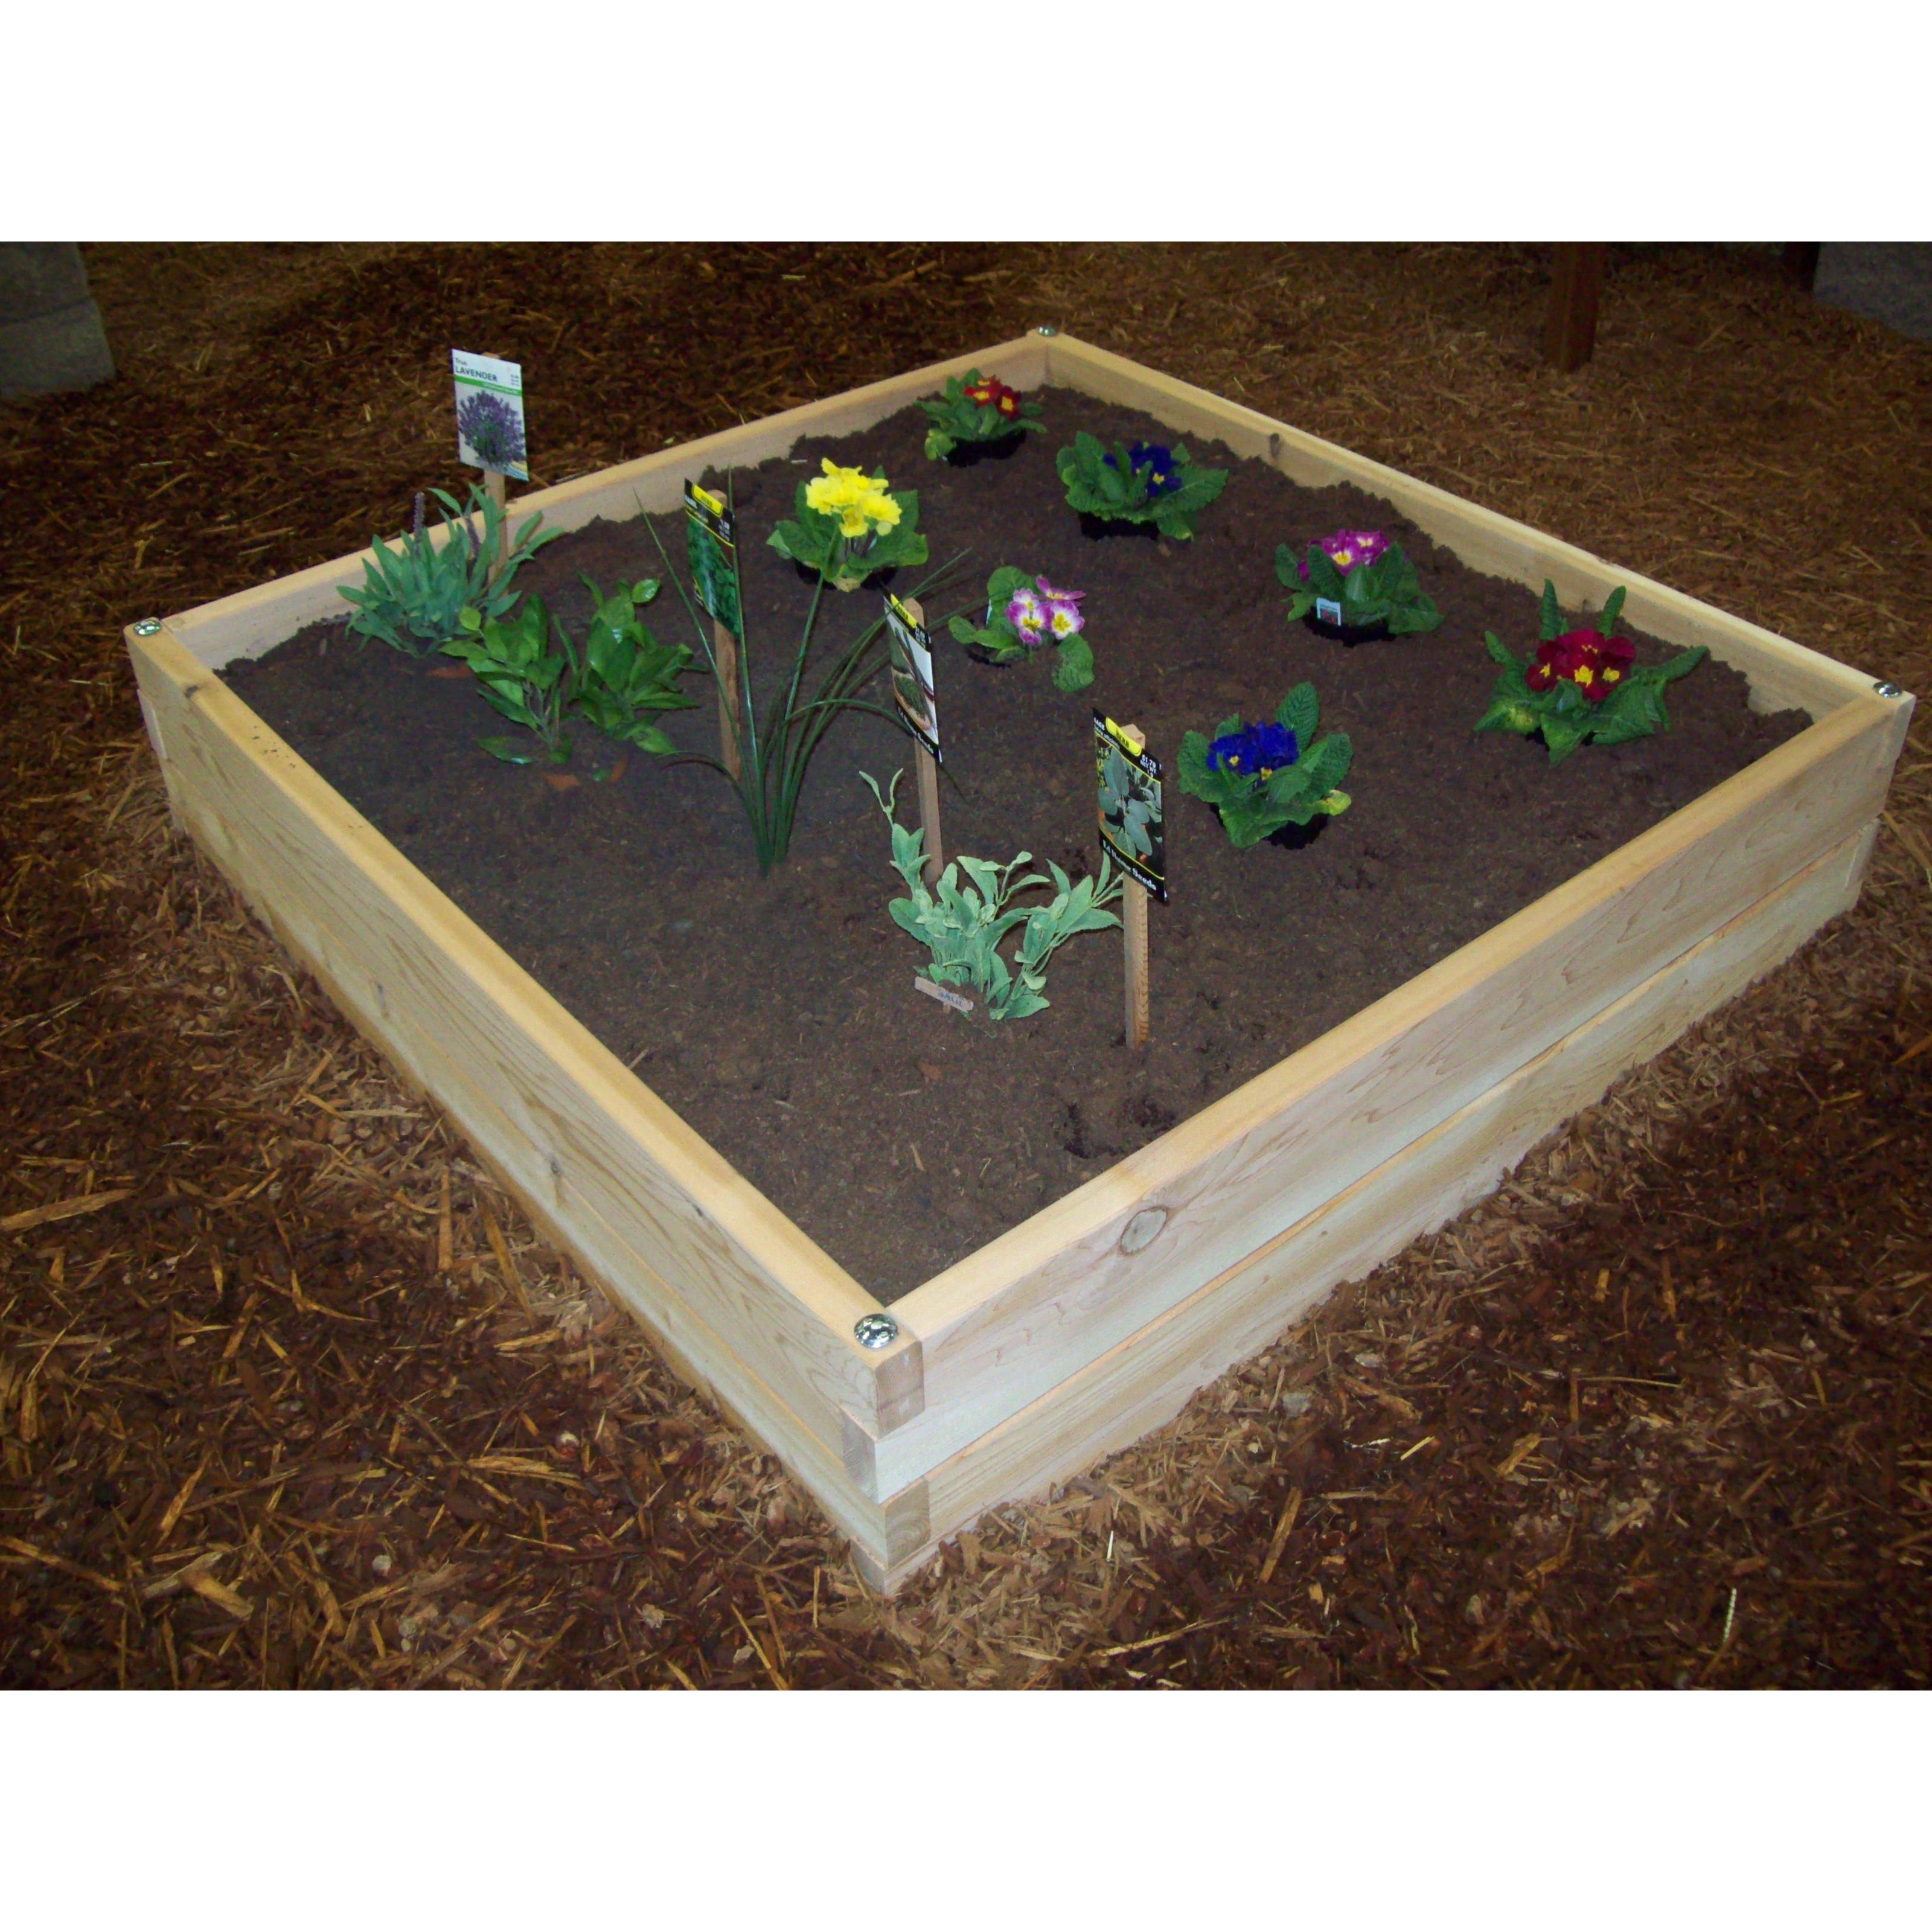 Wood Country Cedar Raised Garden Bed